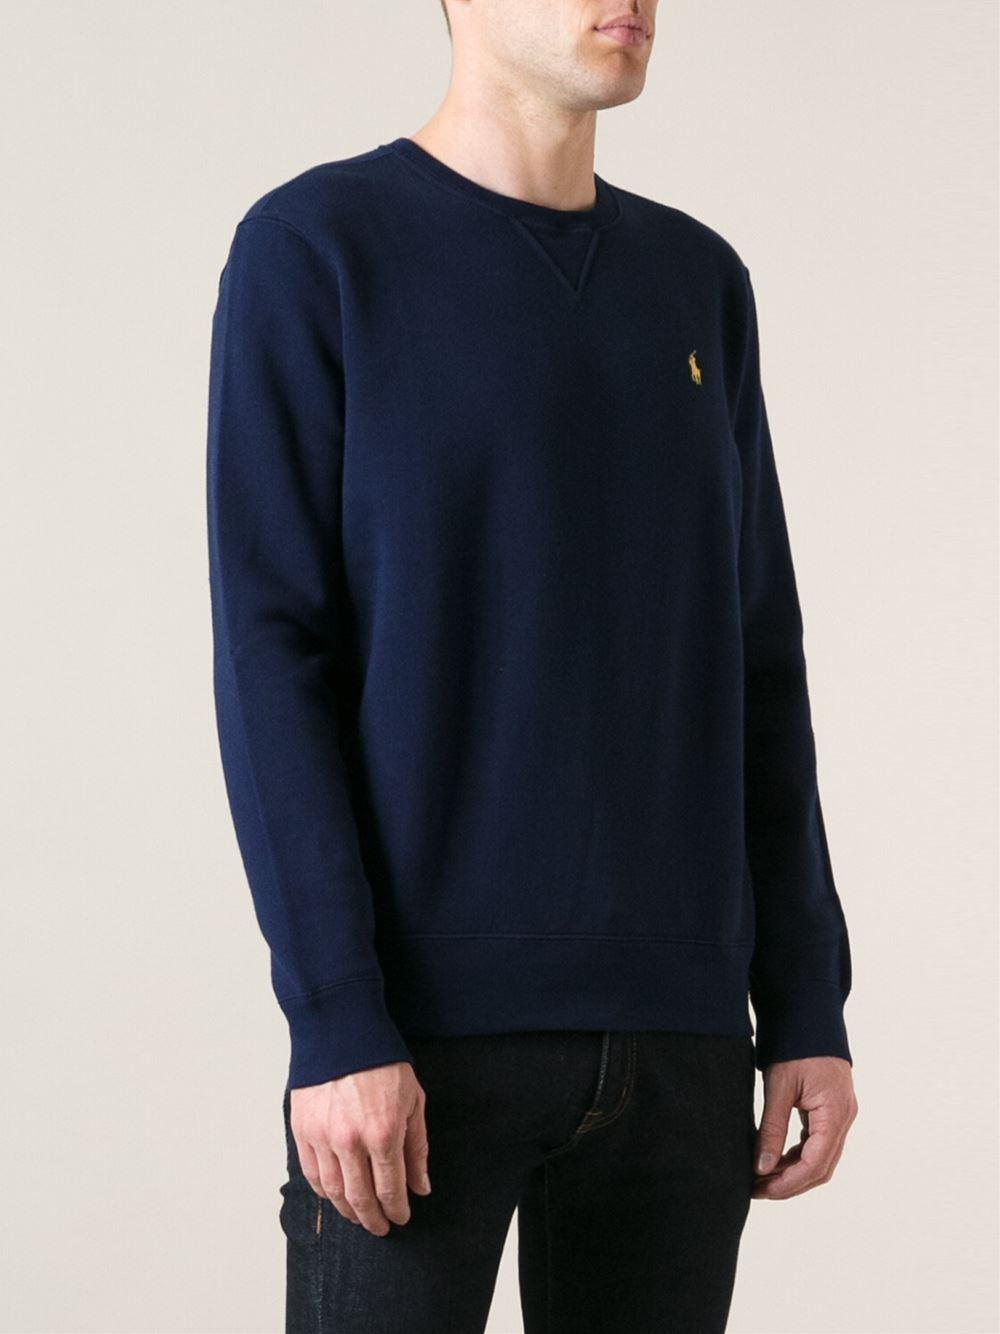 polo ralph lauren classic sweatshirt in blue for men lyst. Black Bedroom Furniture Sets. Home Design Ideas